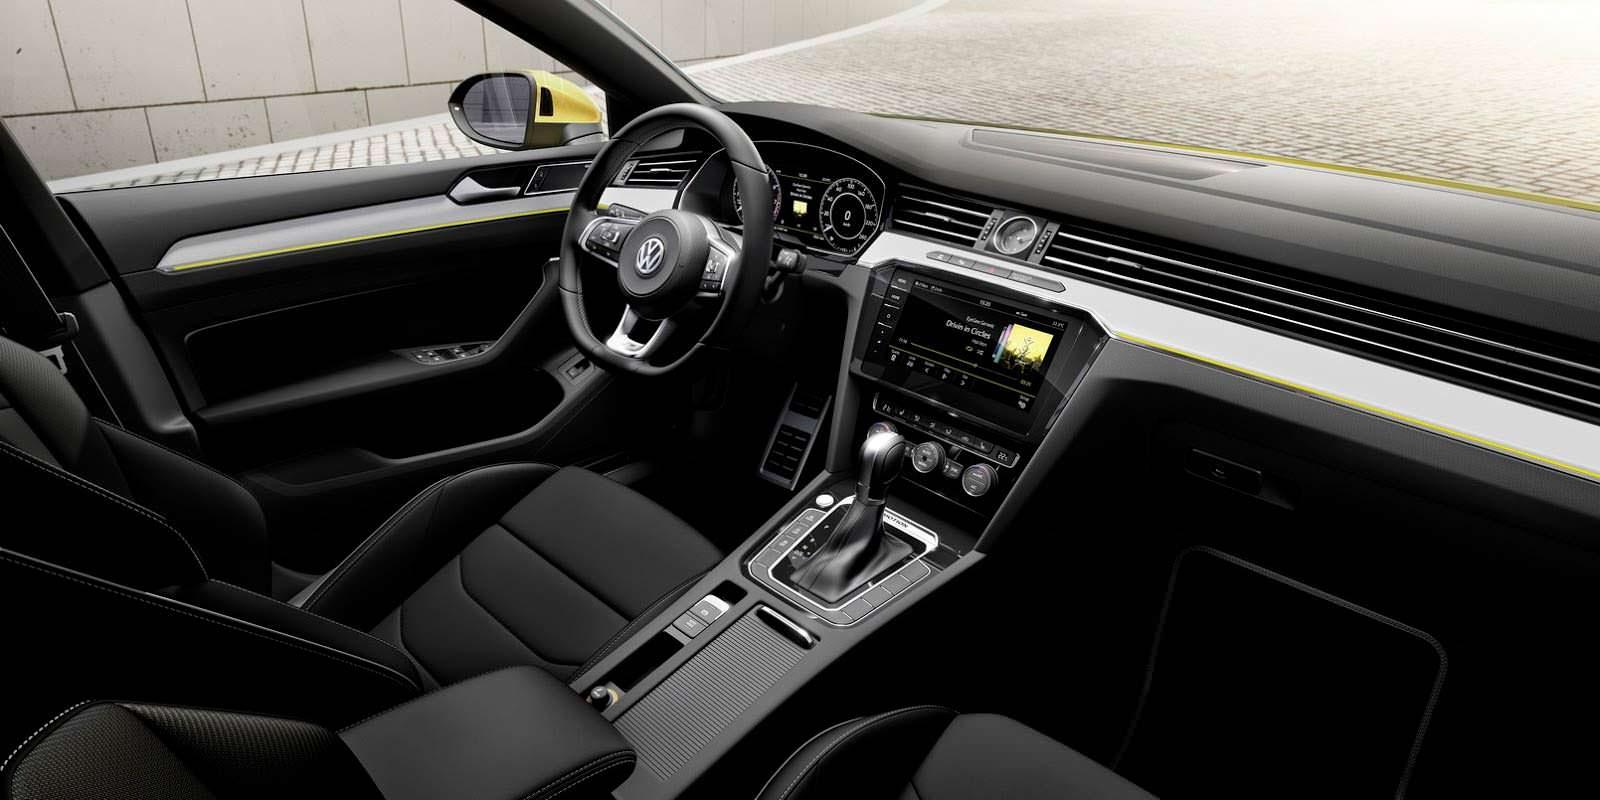 Салон Volkswagen Arteon похож на Passat